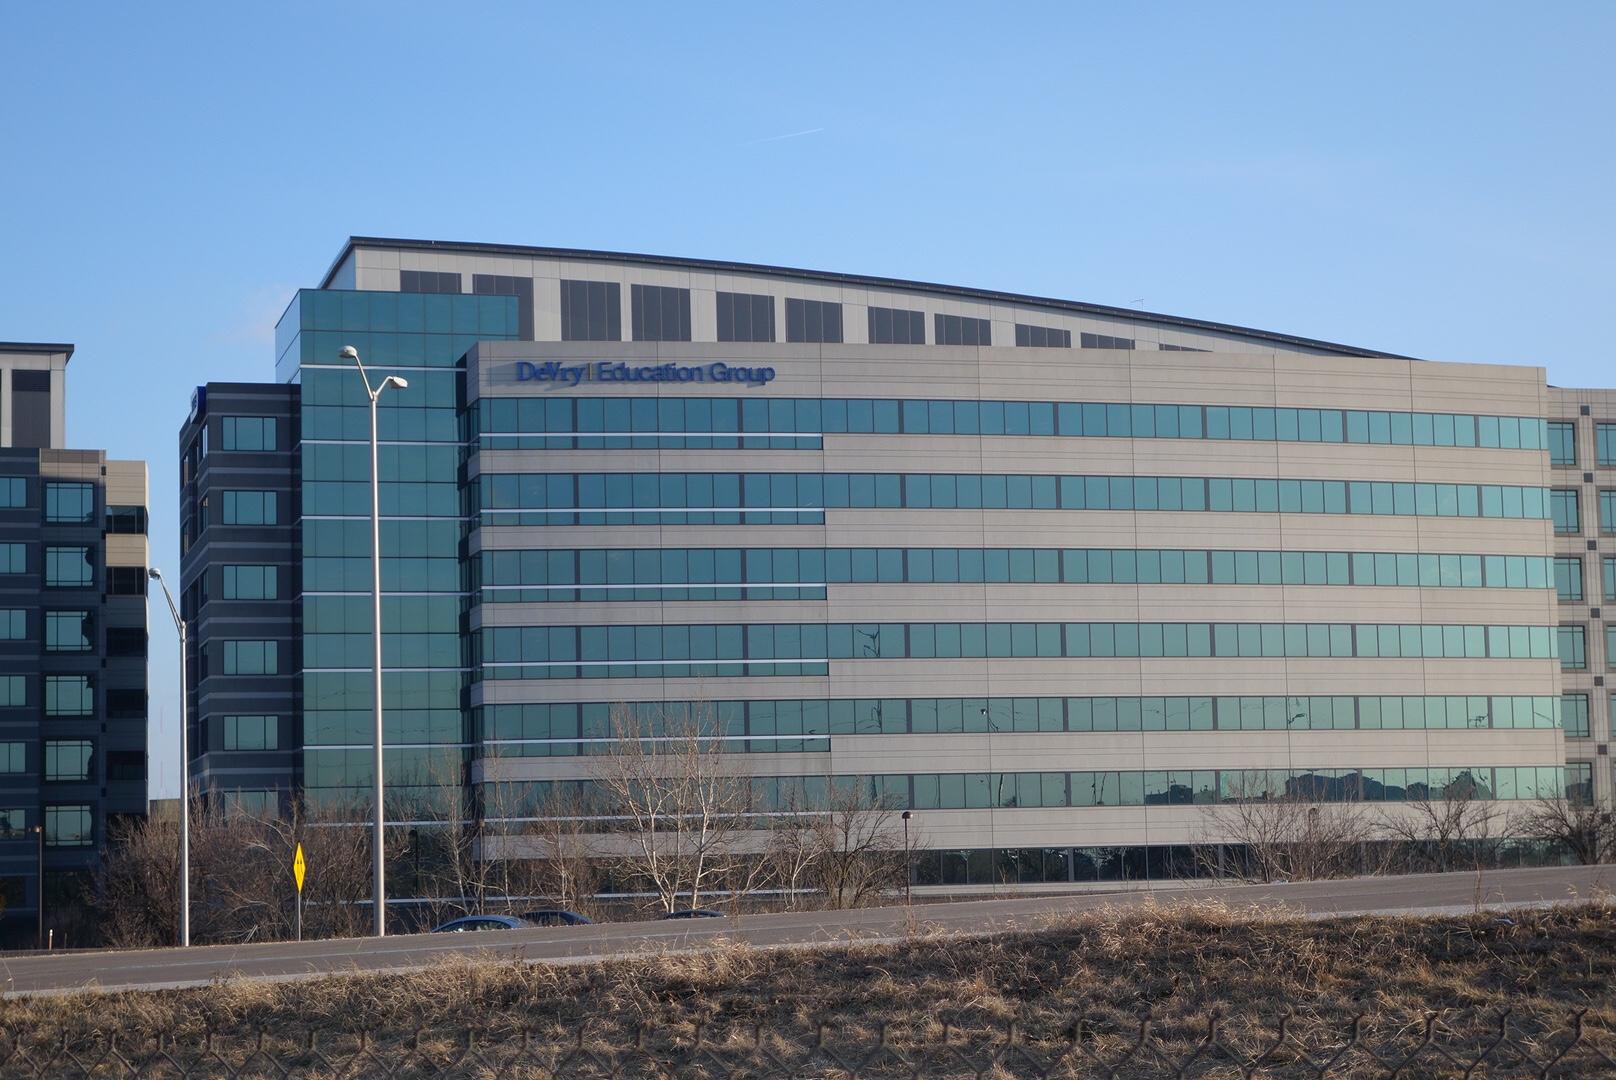 DeVry's corporate headquarters in Downers Grove, Illinois.